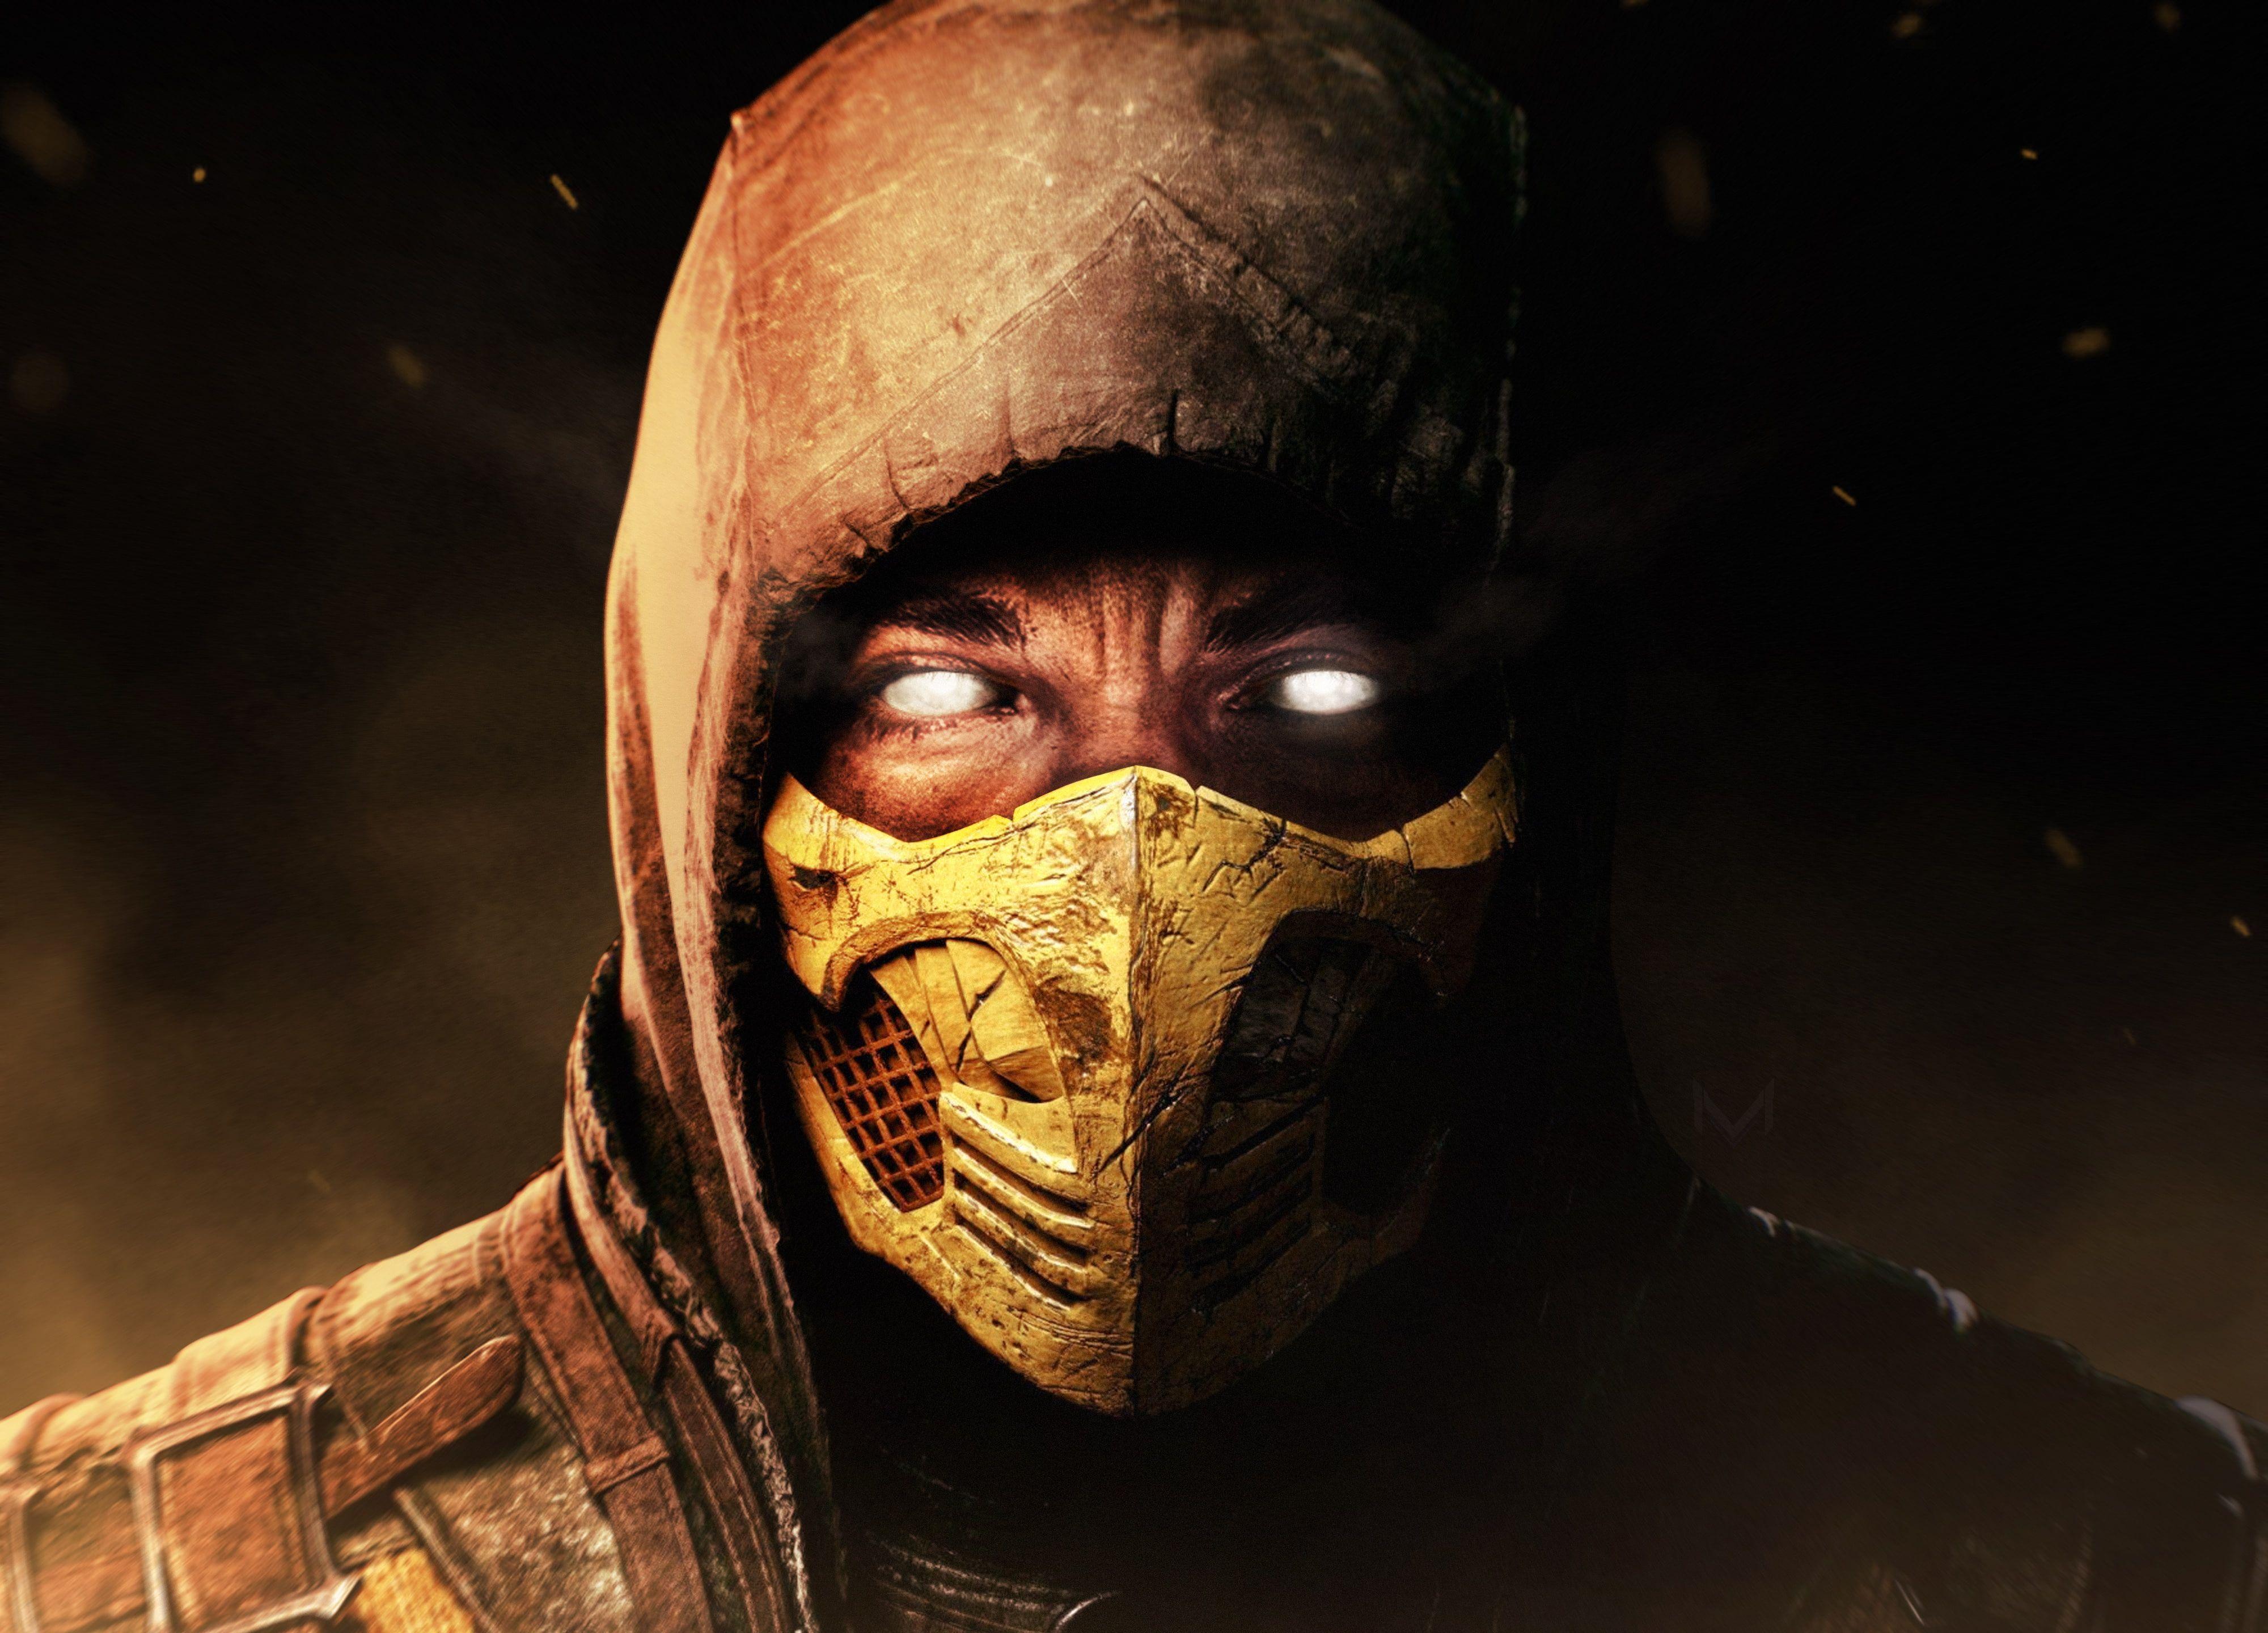 Scorpion Mortal Kombat X 4k 4k Wallpaper Hdwallpaper Desktop Mortal Kombat Mortal Kombat X Hd Wallpaper